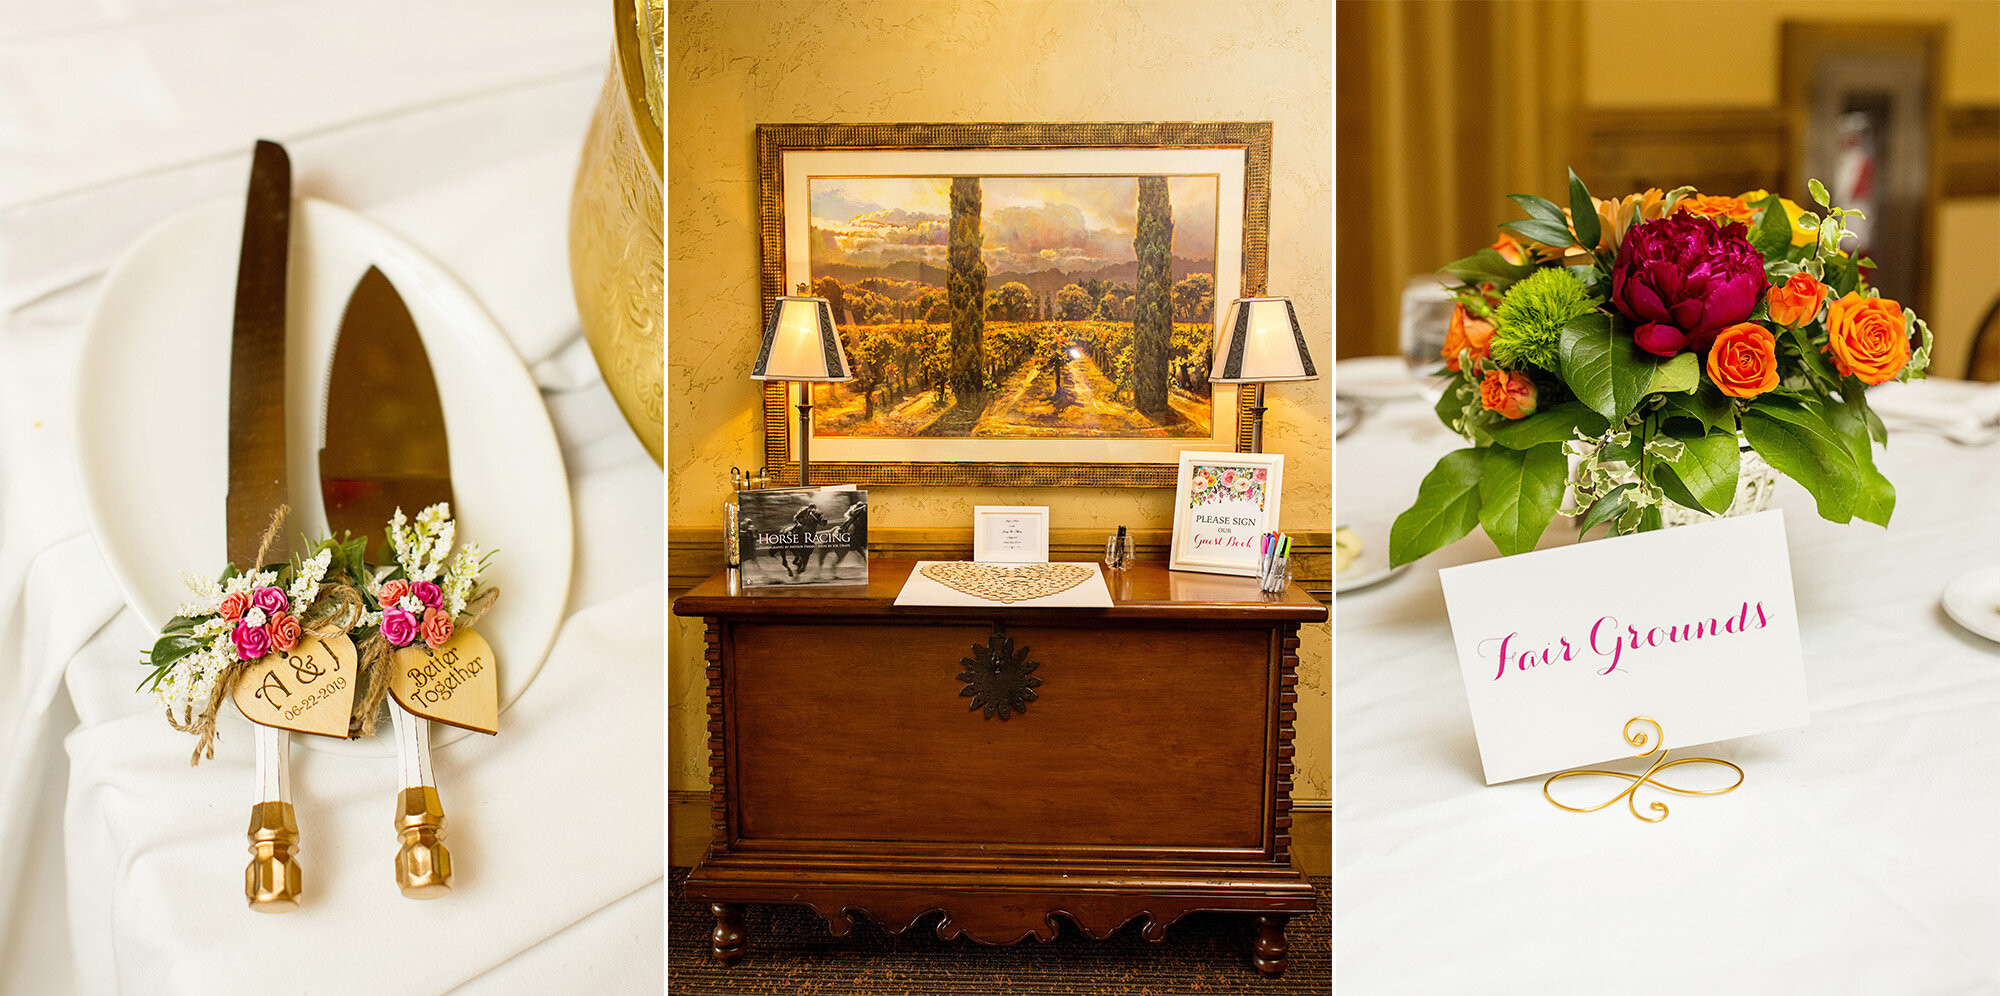 Seriously_Sabrina_Photography_Colorado_Springs_Club_at_Flying_Horse_Destination_Wedding_ODwyer92.jpg